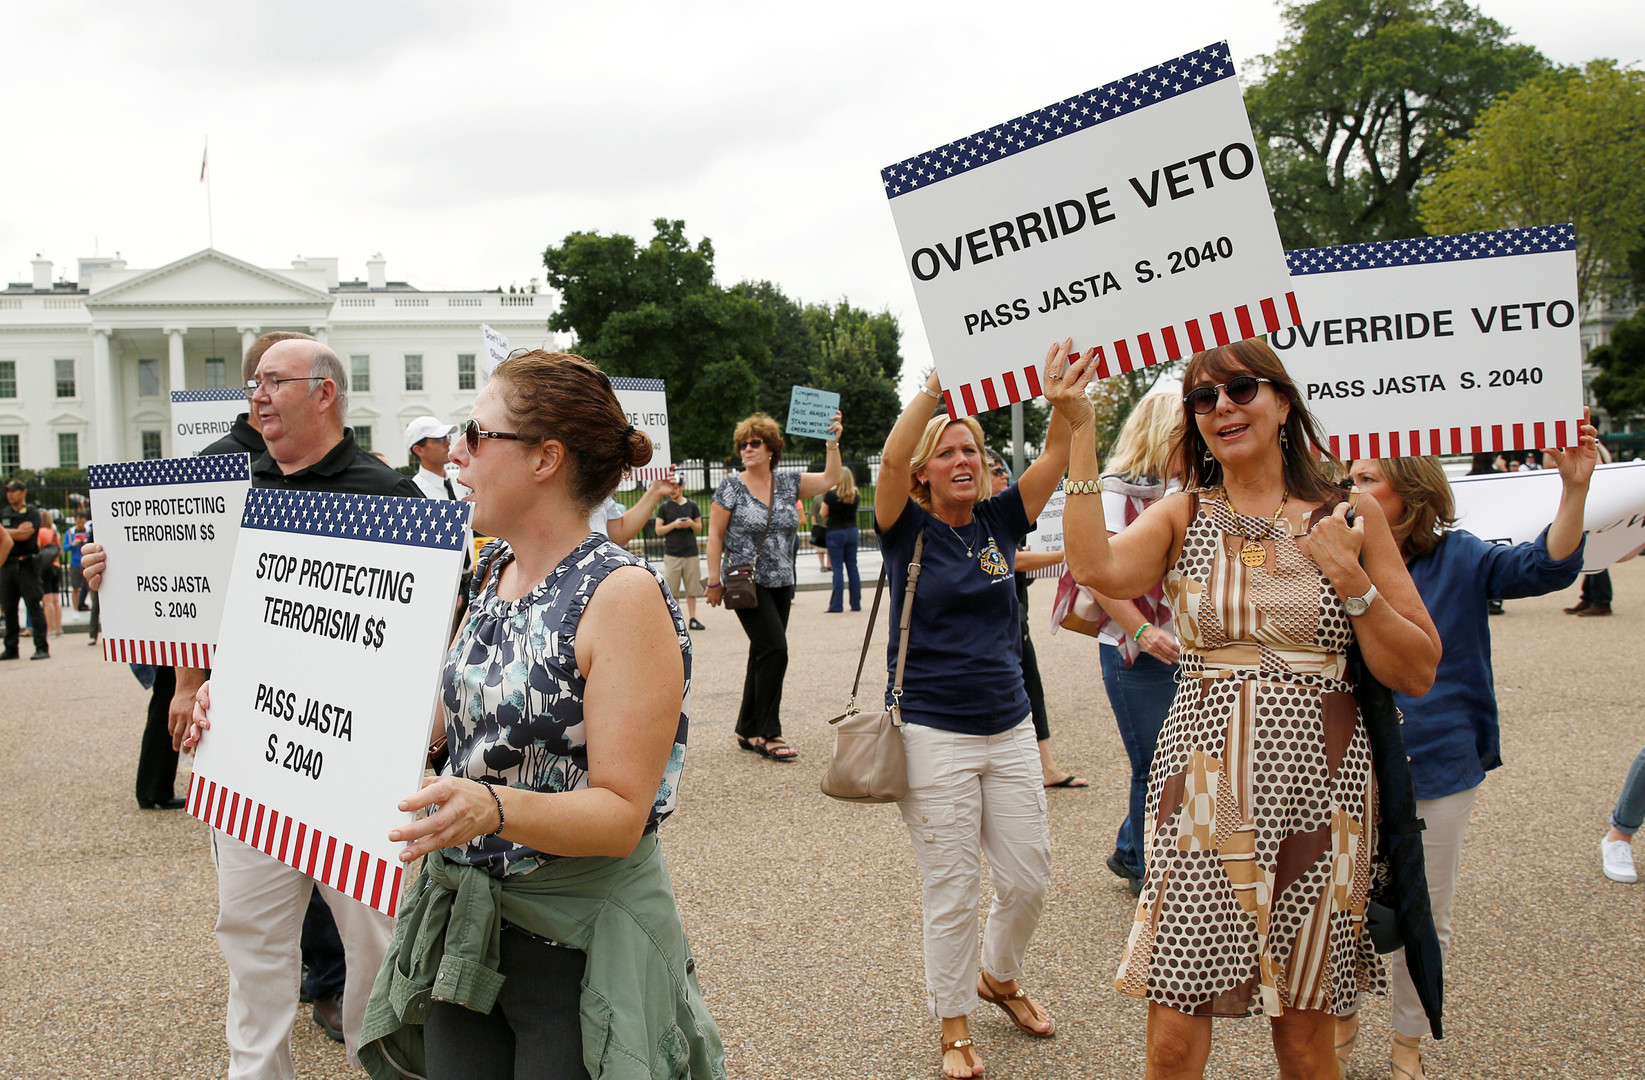 Дружба дороже: Обама наложил вето на закон об исках к Эр-Рияду в связи с терактами 9/11